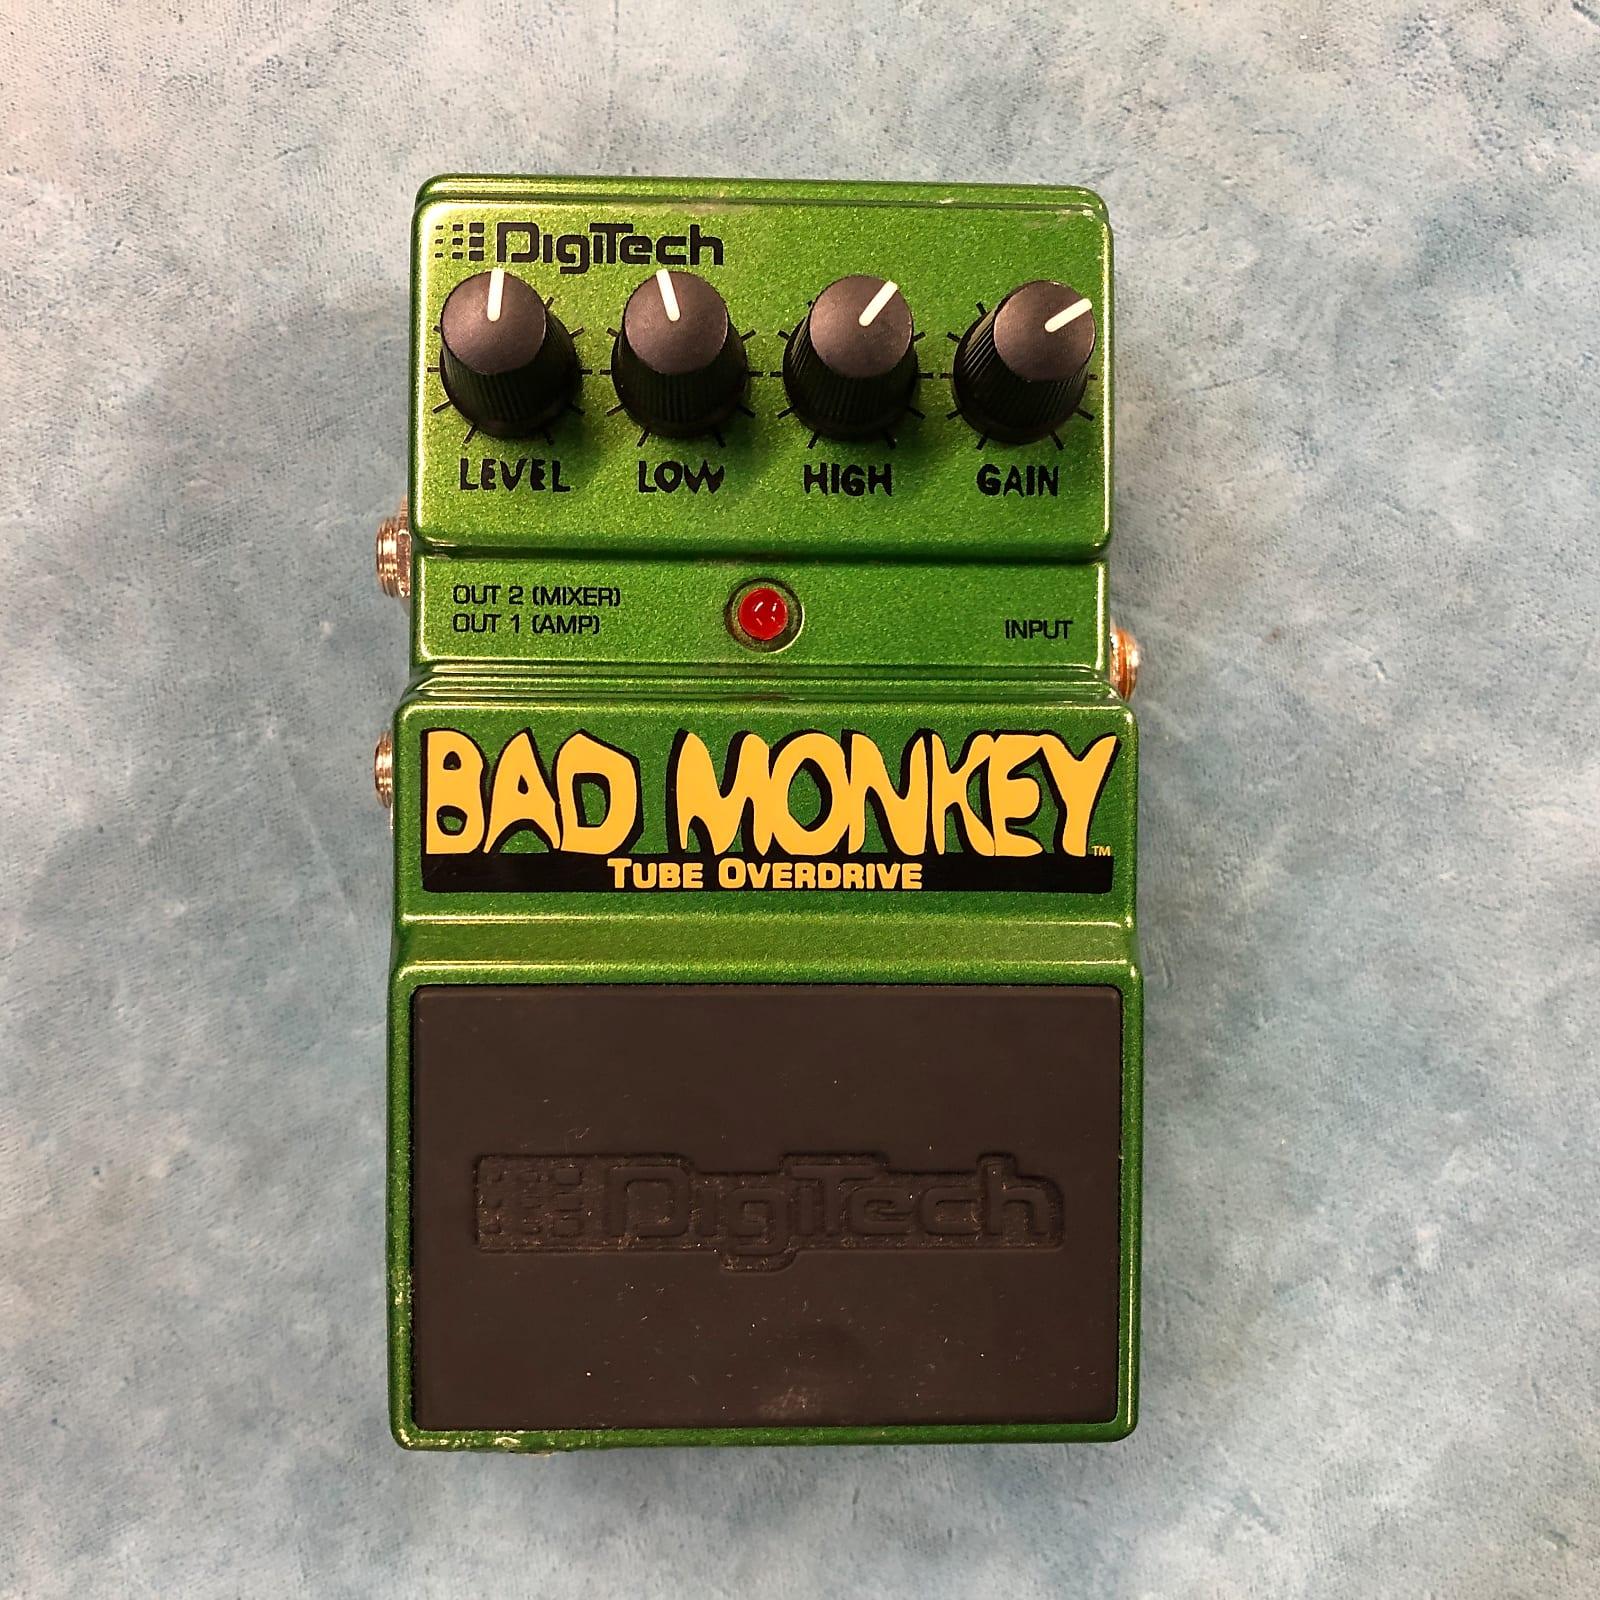 DigiTech DBM Bad Monkey Tube Overdrive Effects Pedal